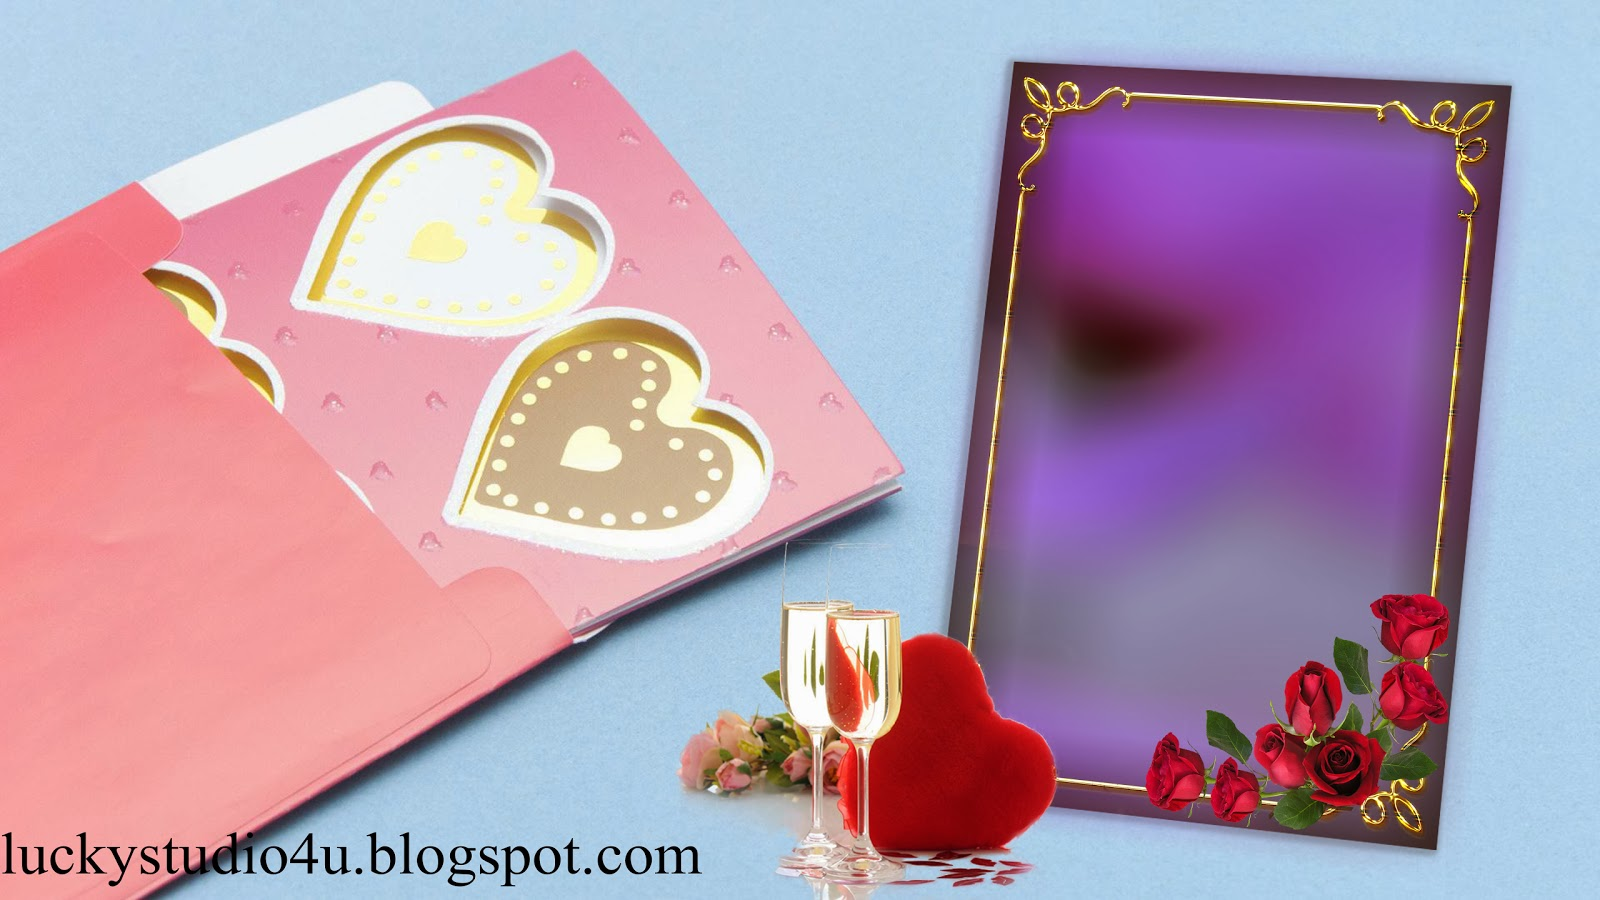 16 Digital Wedding Album PSD Files Images